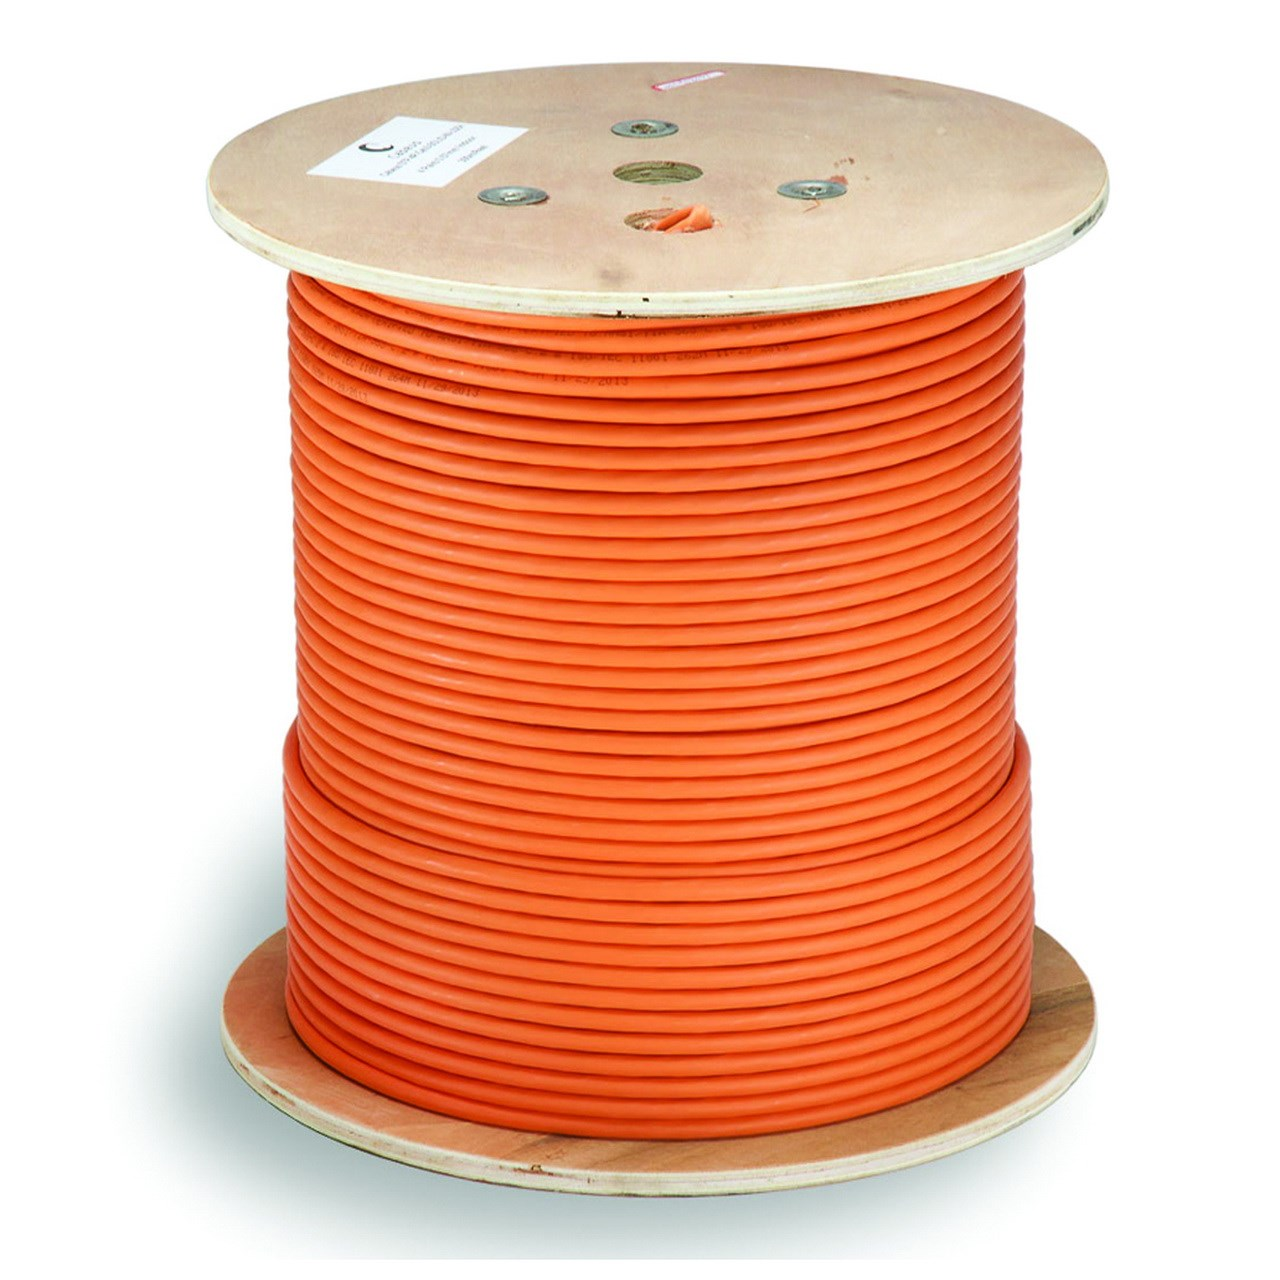 کابل شبکه Cat6 UTP CCC حلقه ای